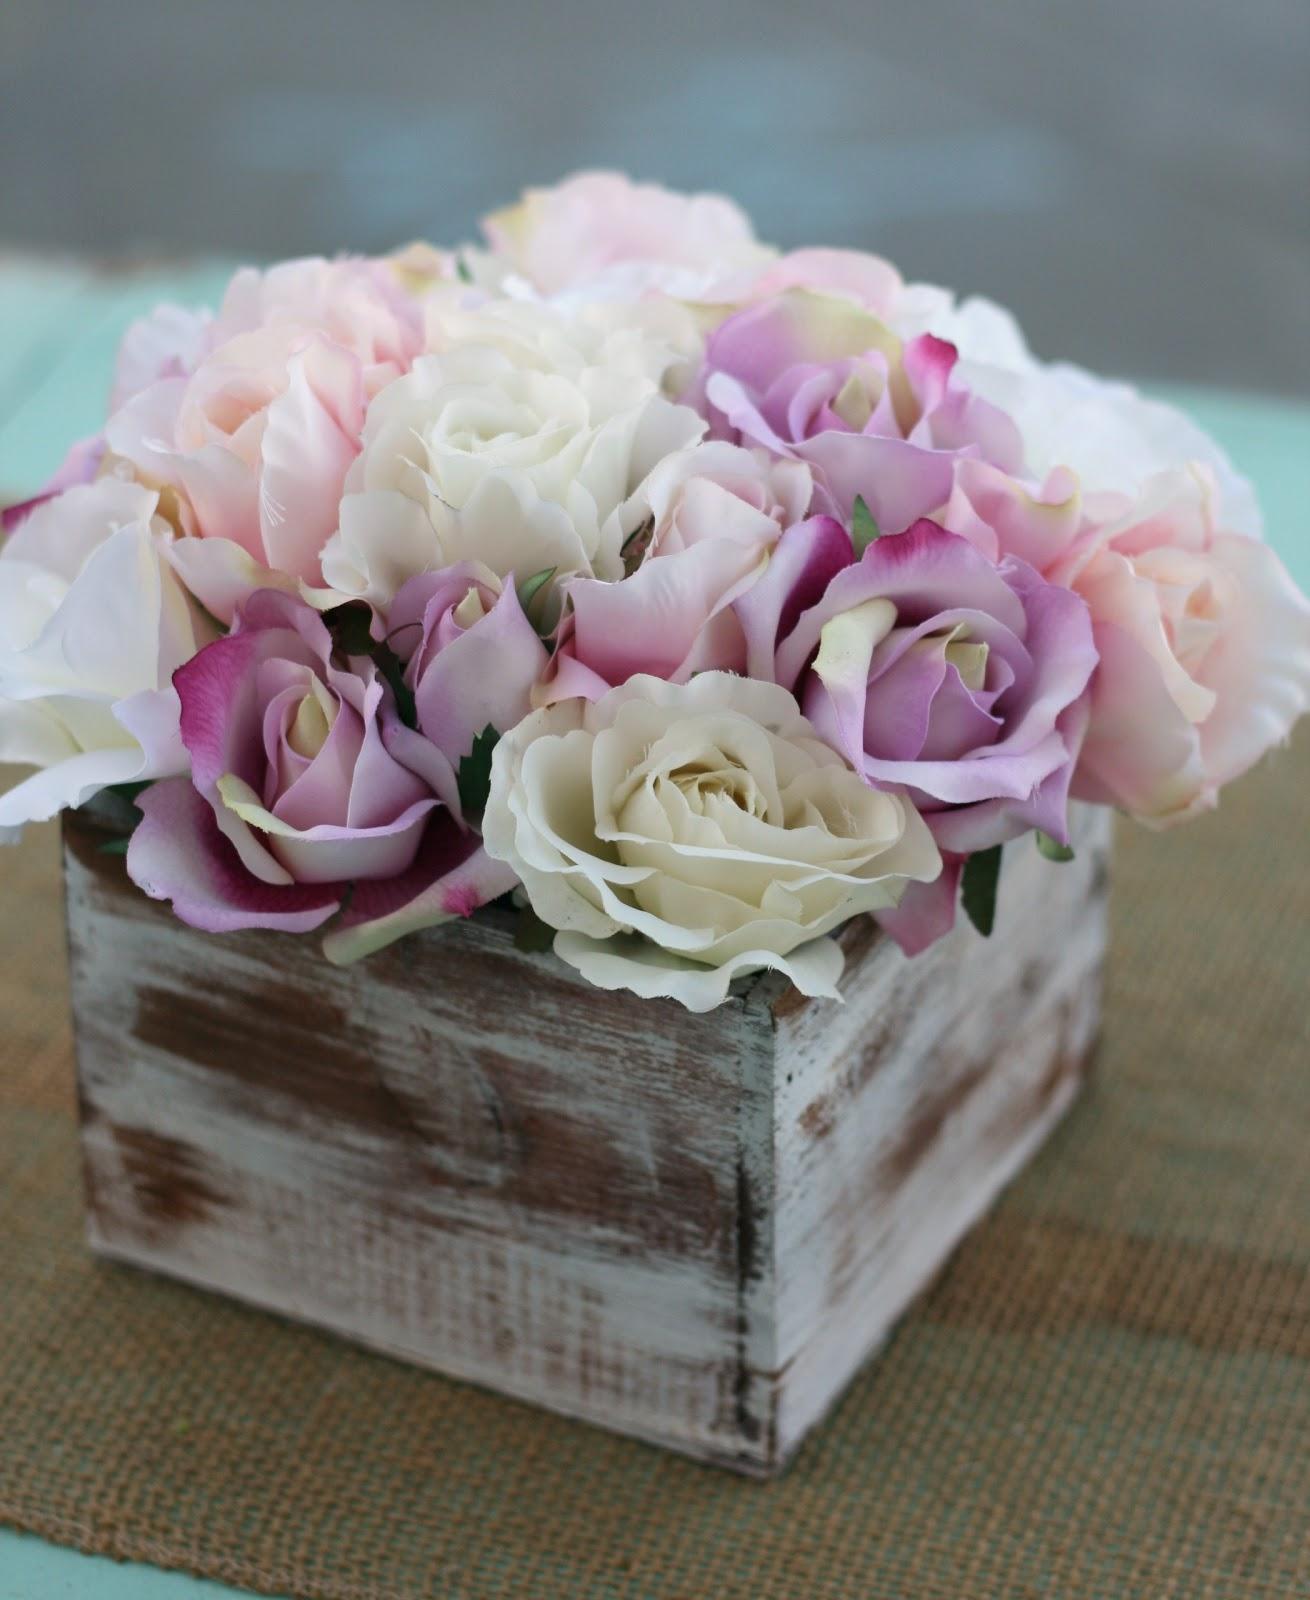 Rustic Wedding Ideas And Arrangements: Morgann Hill Designs: Shabby Chic Rustic Flower Bouquet